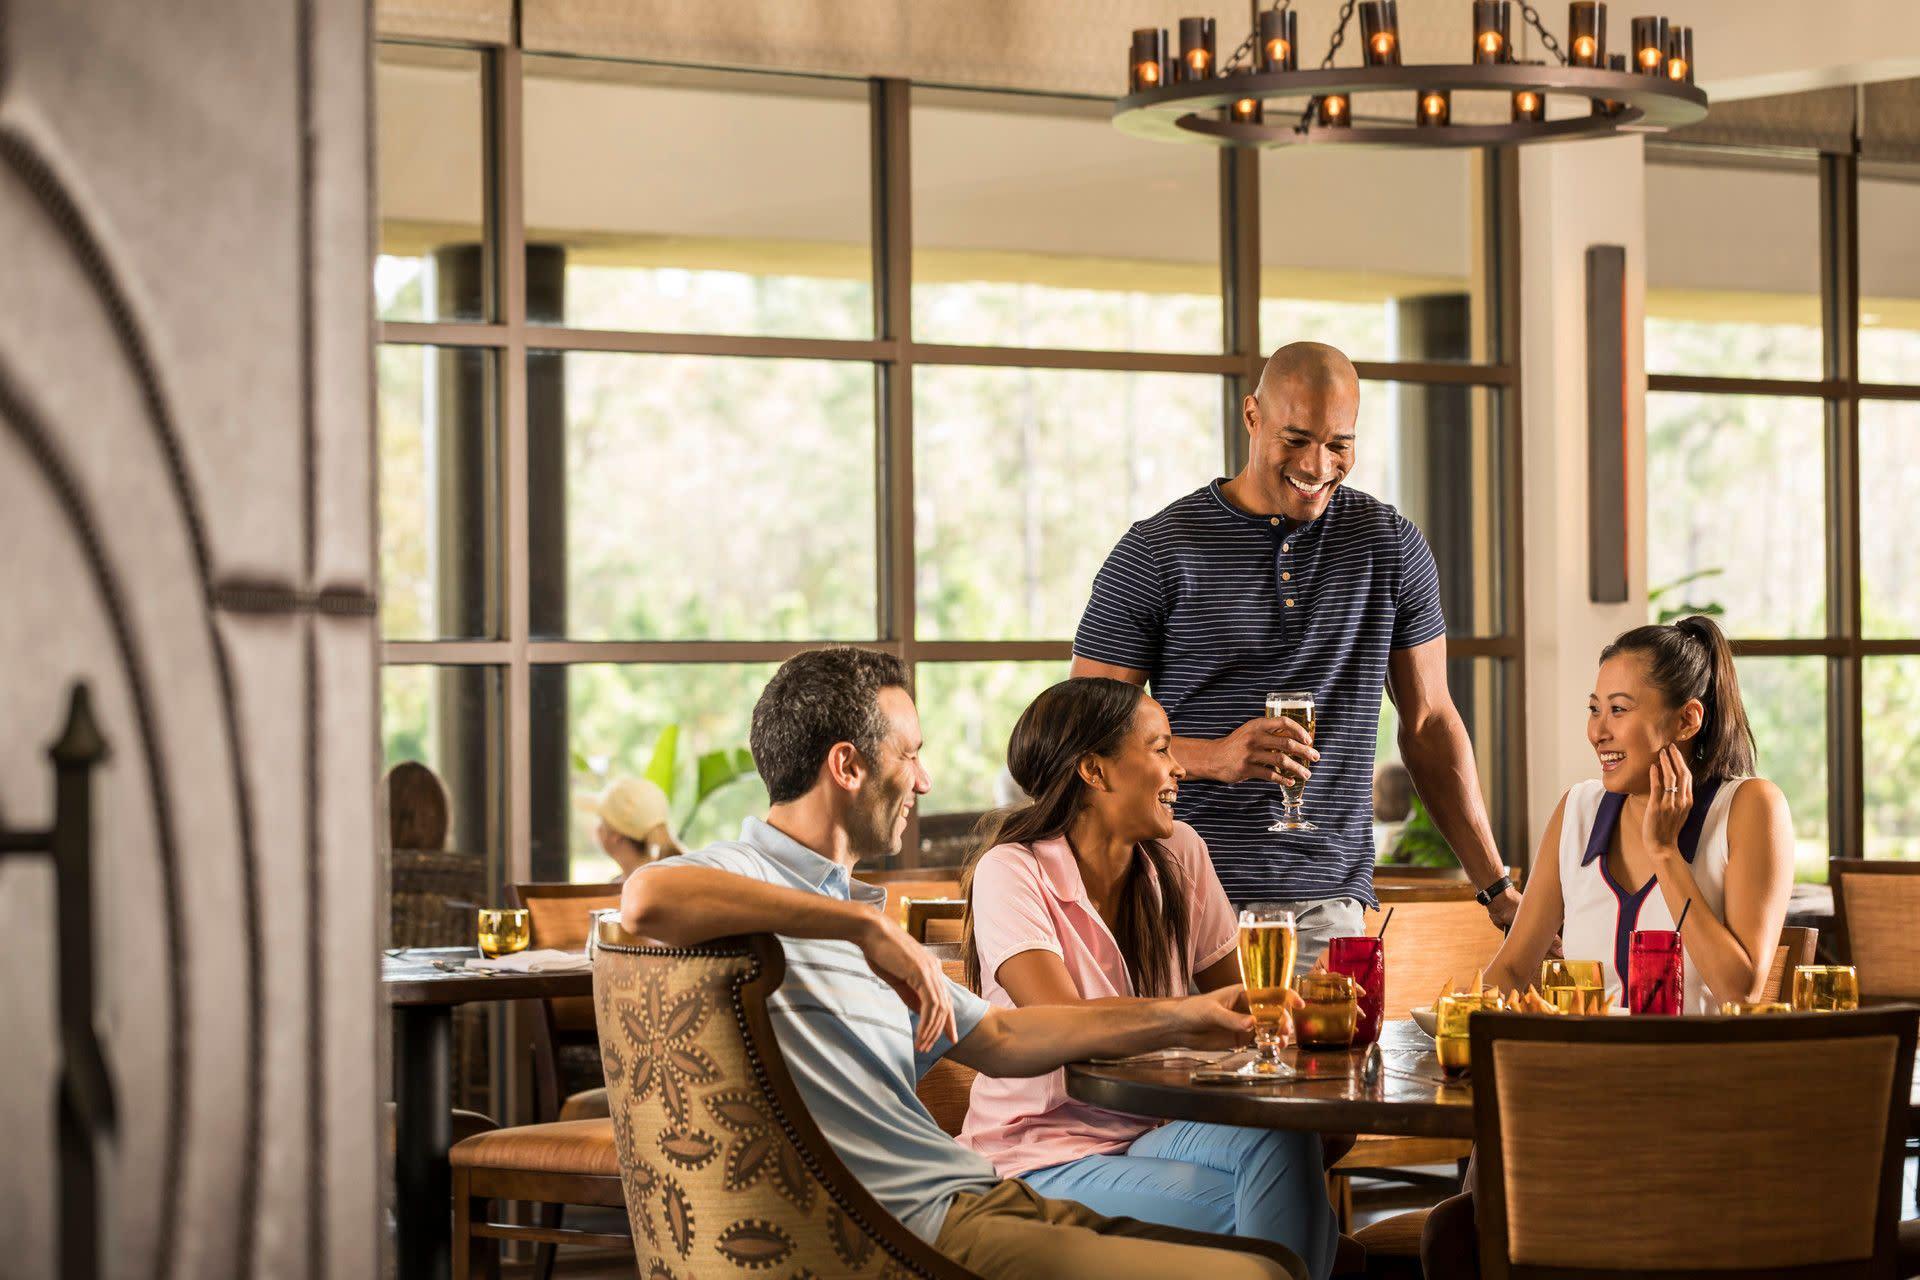 Plancha at Four Seasons Resort Orlando at Walt Disney World Resort